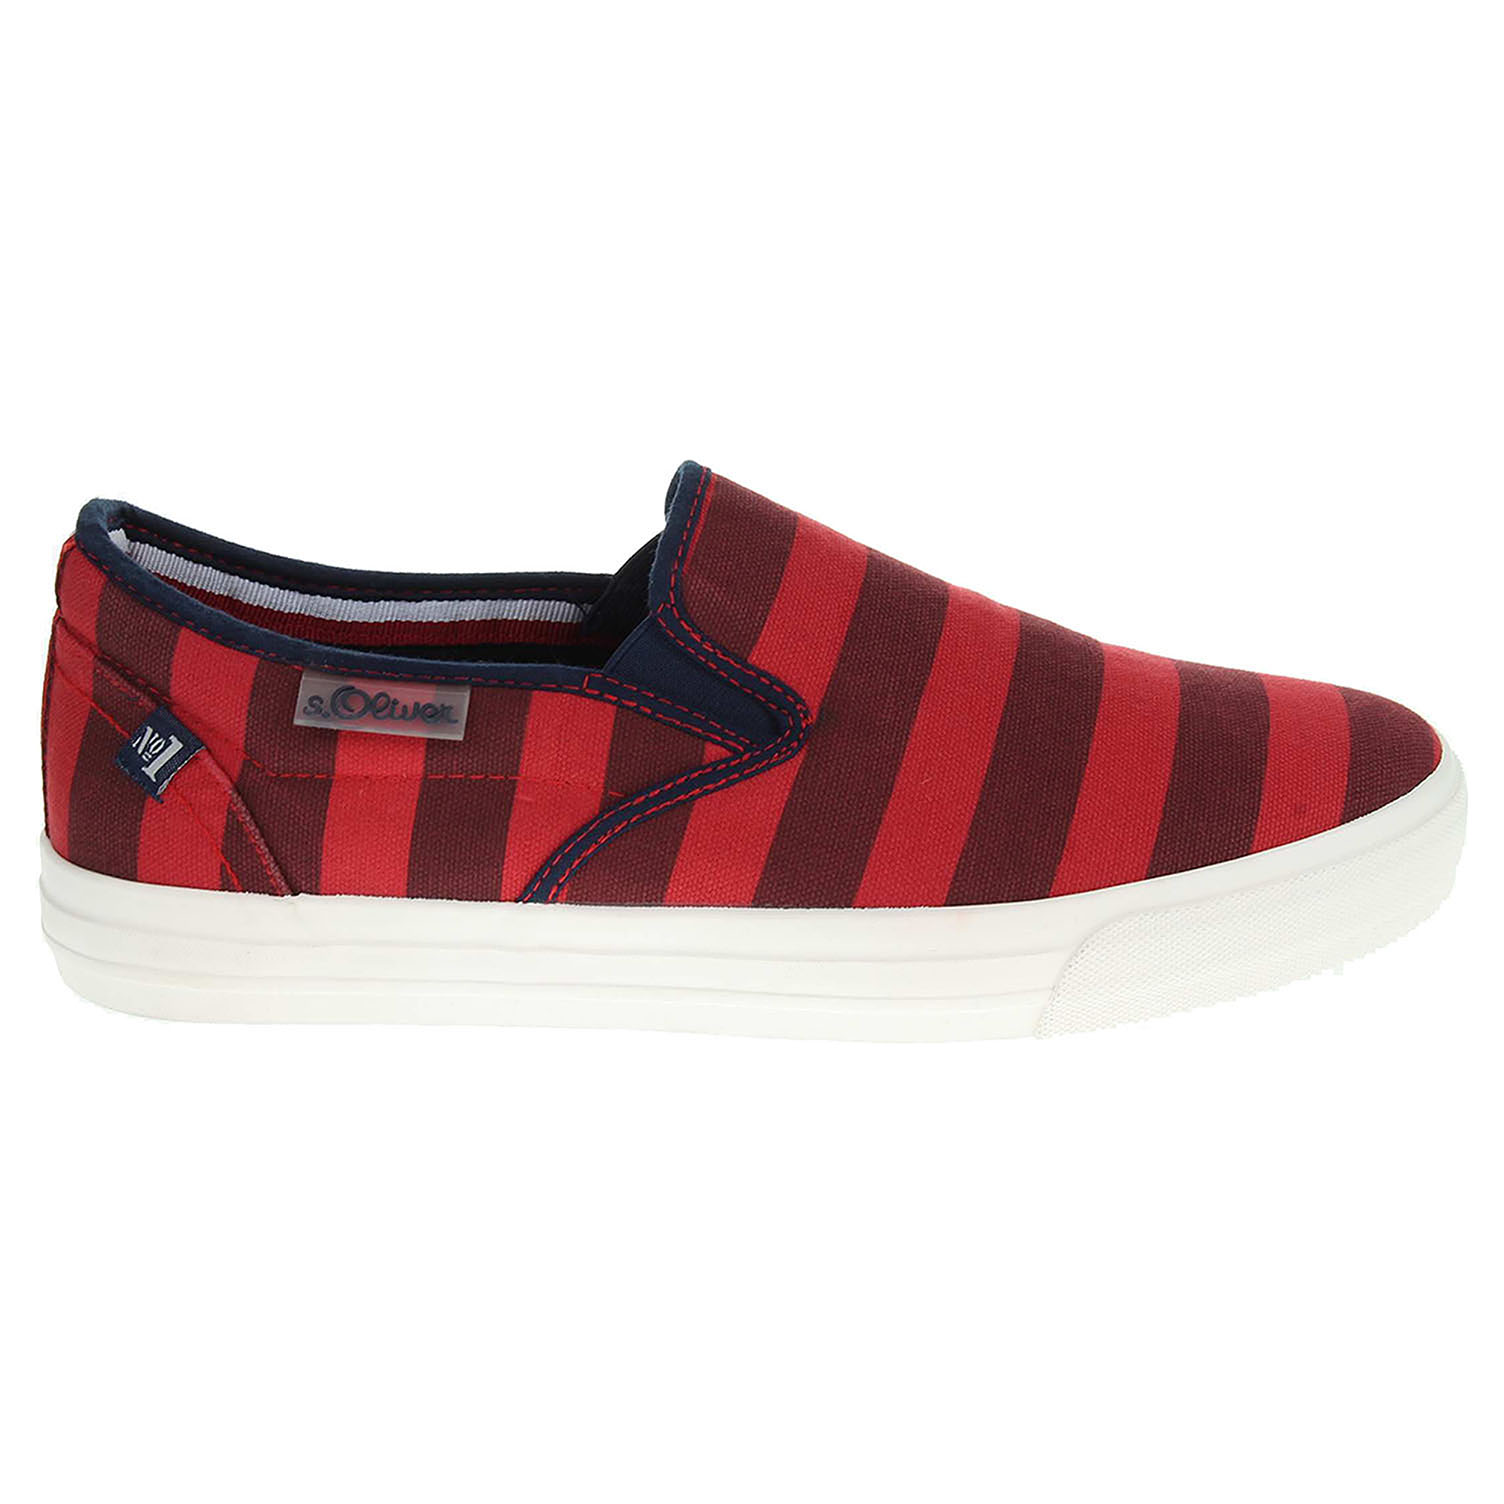 Ecco s.Oliver pánská obuv 5-14605-36 červená 24000391